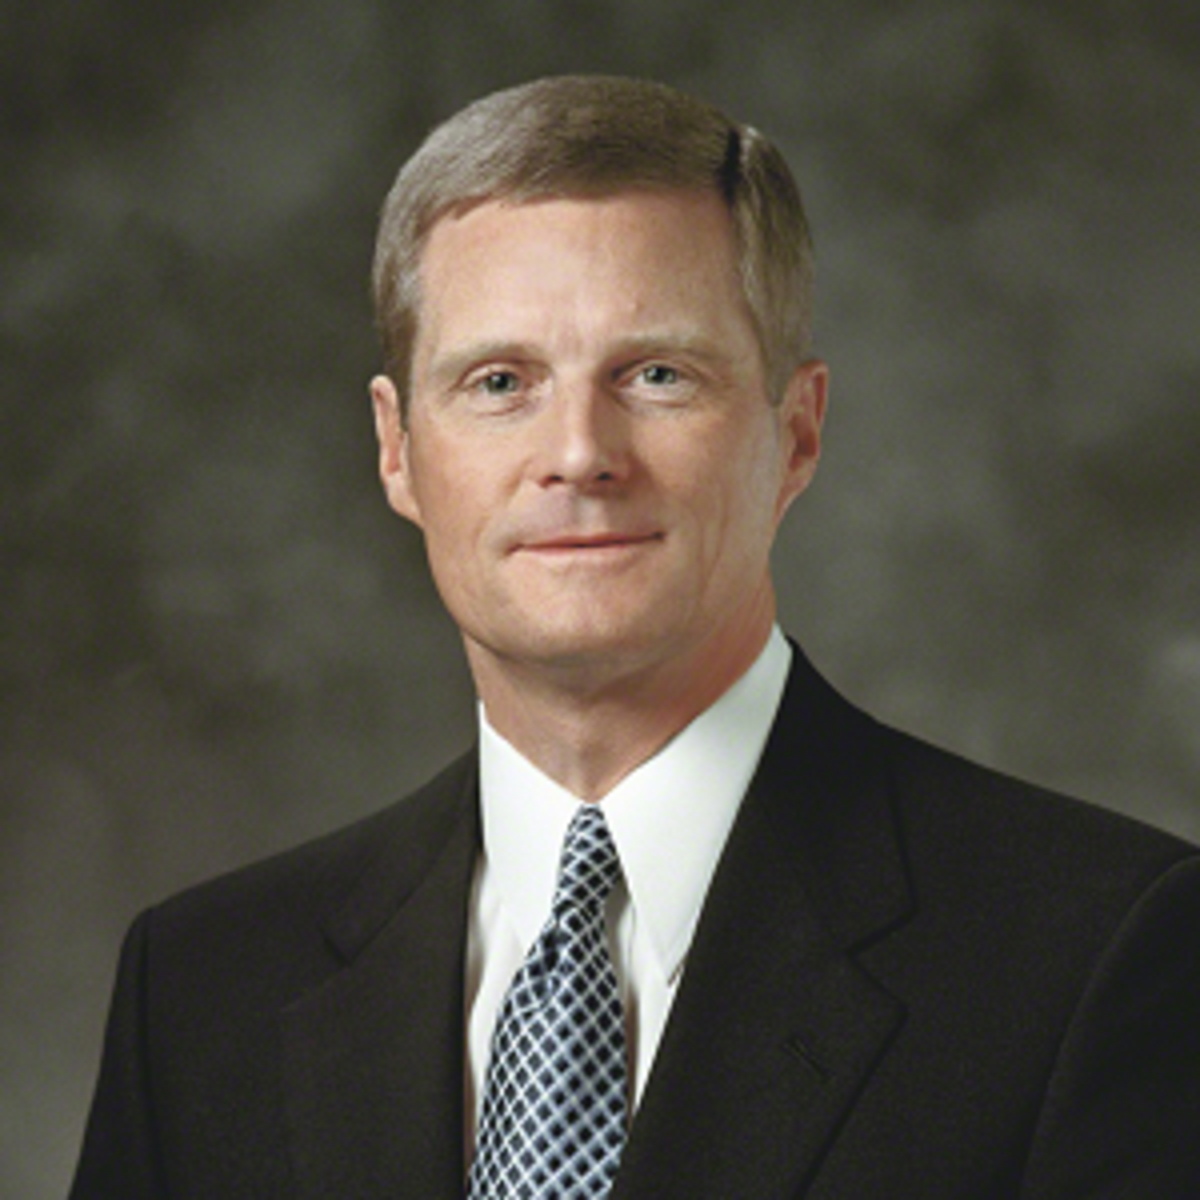 Elder David A Bednar